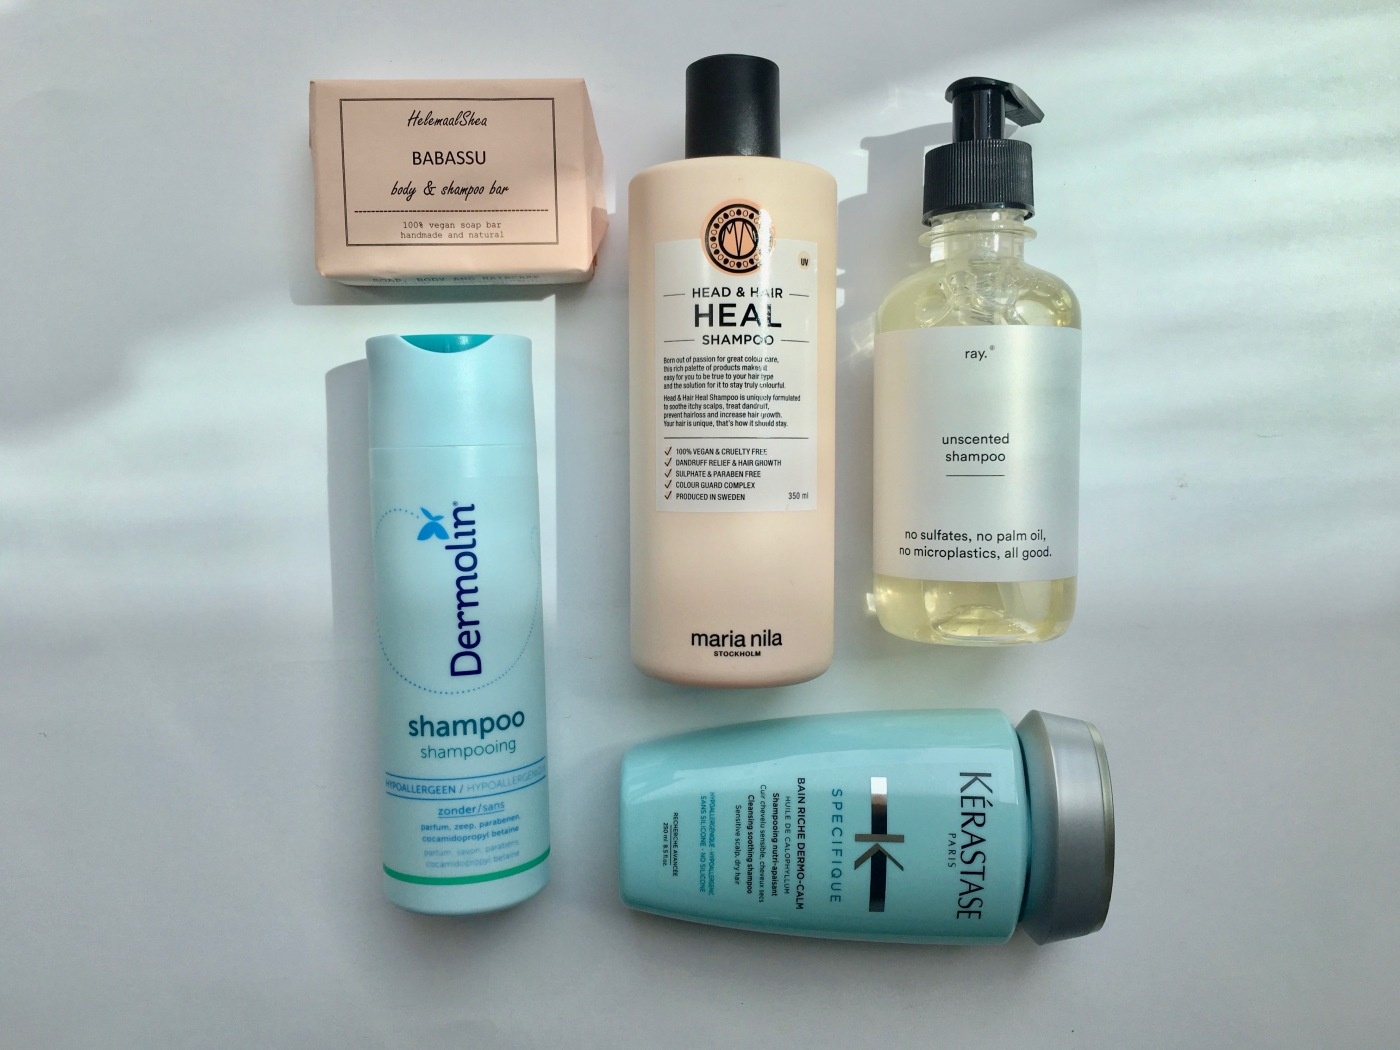 dermolin shampoo babassu body & shampoo bar helemaal shea maria nila head & hair heal shampoo unscented shampoo ray kérastase spécifique shampoo